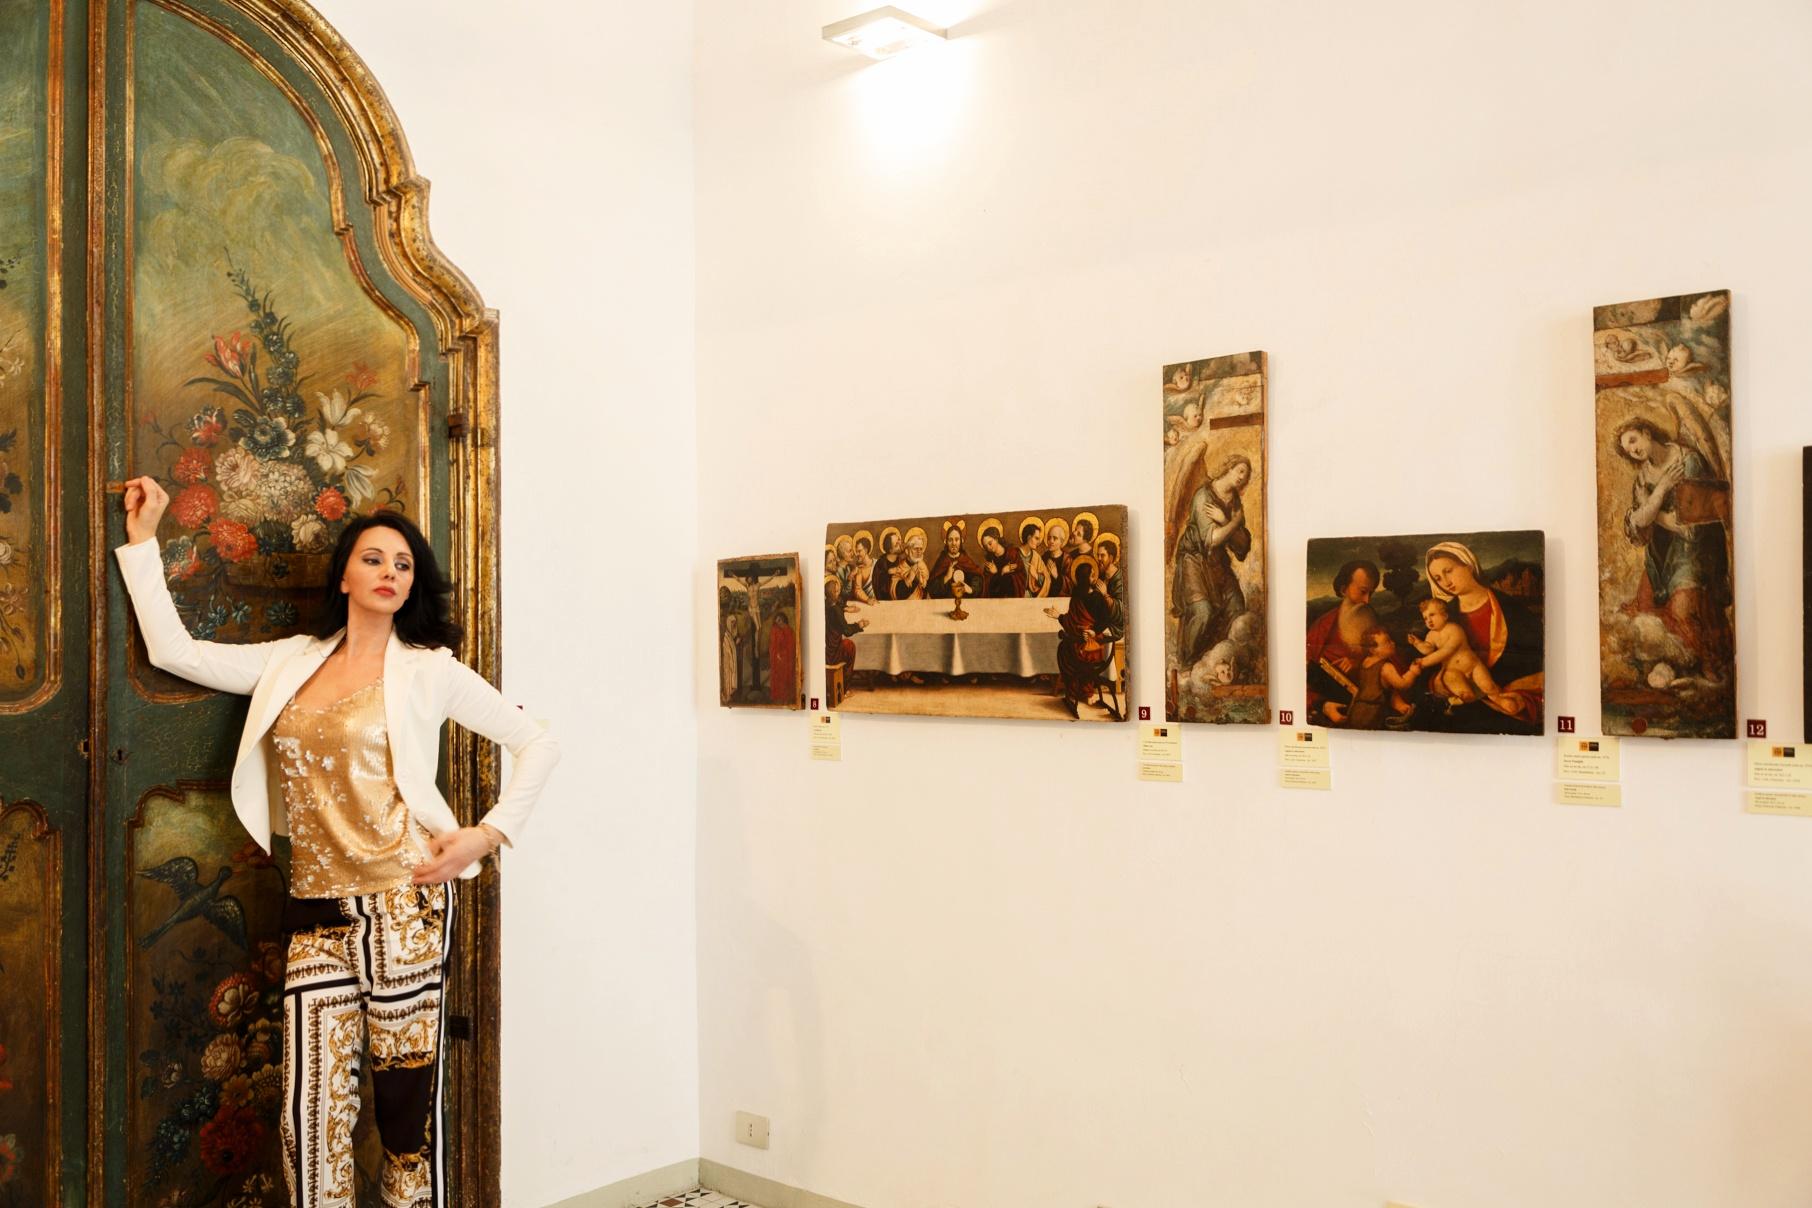 mandralisca Museum Cefalù